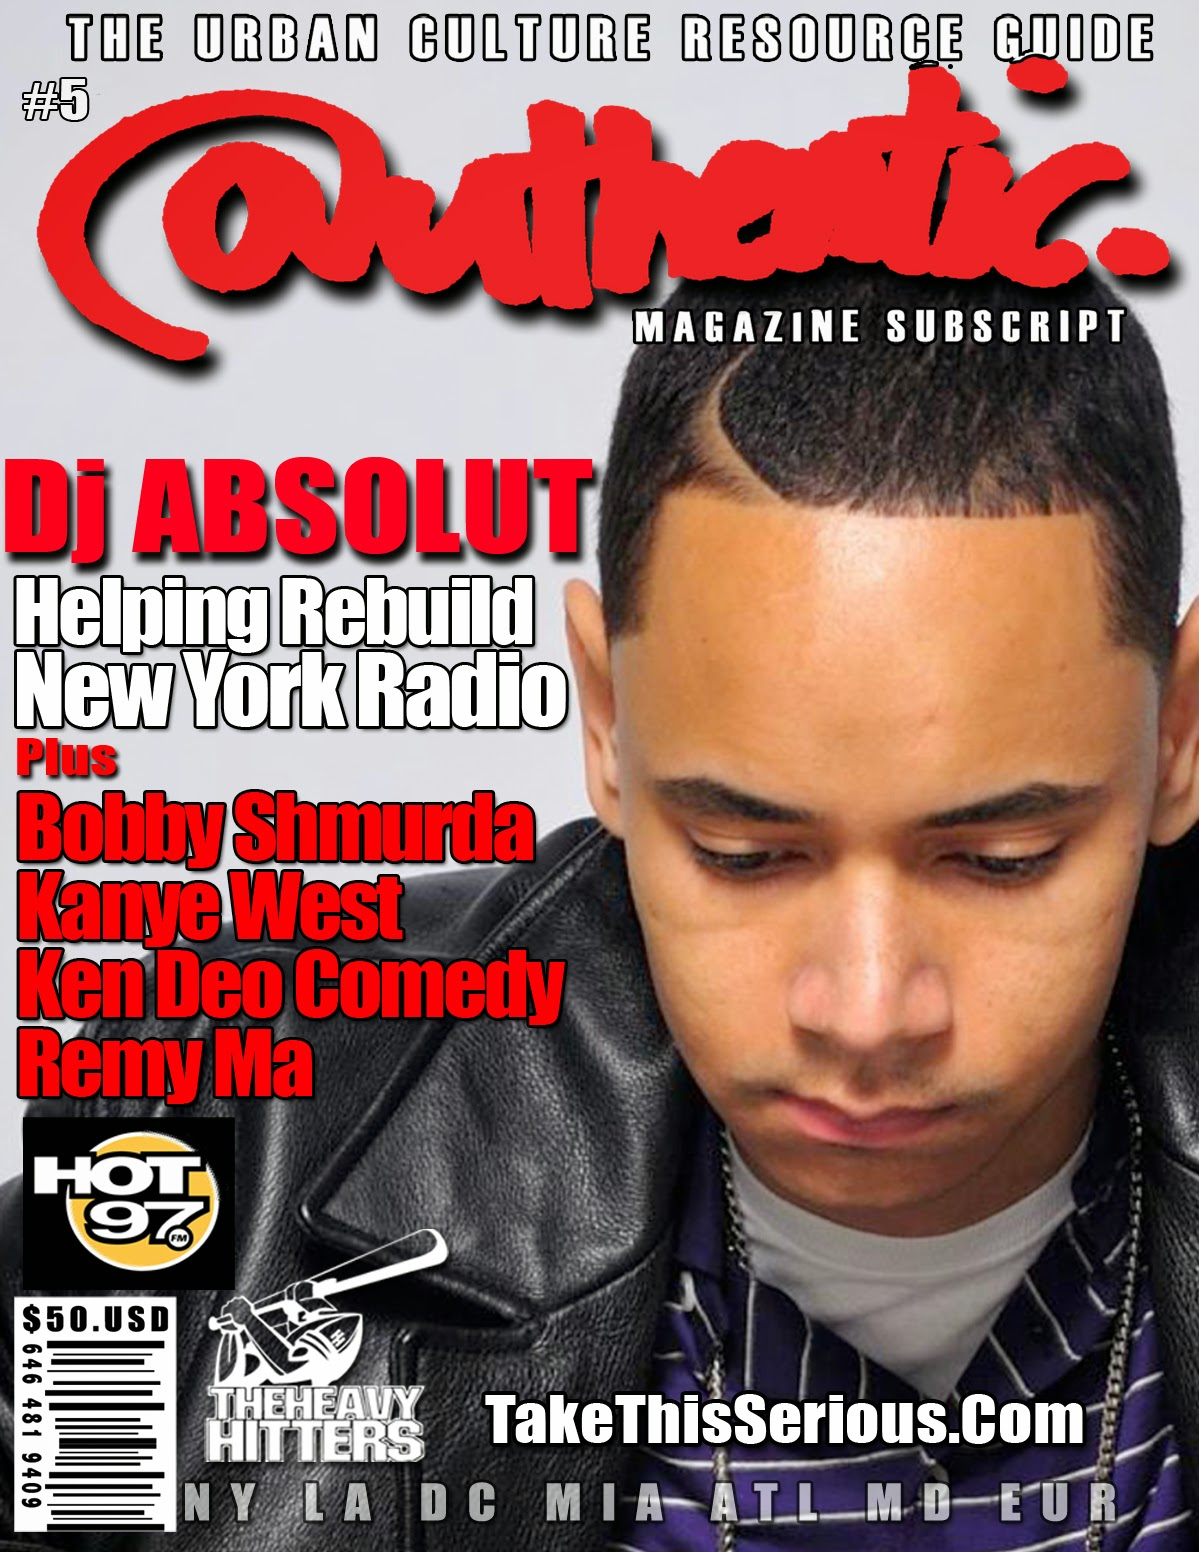 authentic magazine ken deo new york city DJ ABSOLUT ON HOT 97 authenticx.com